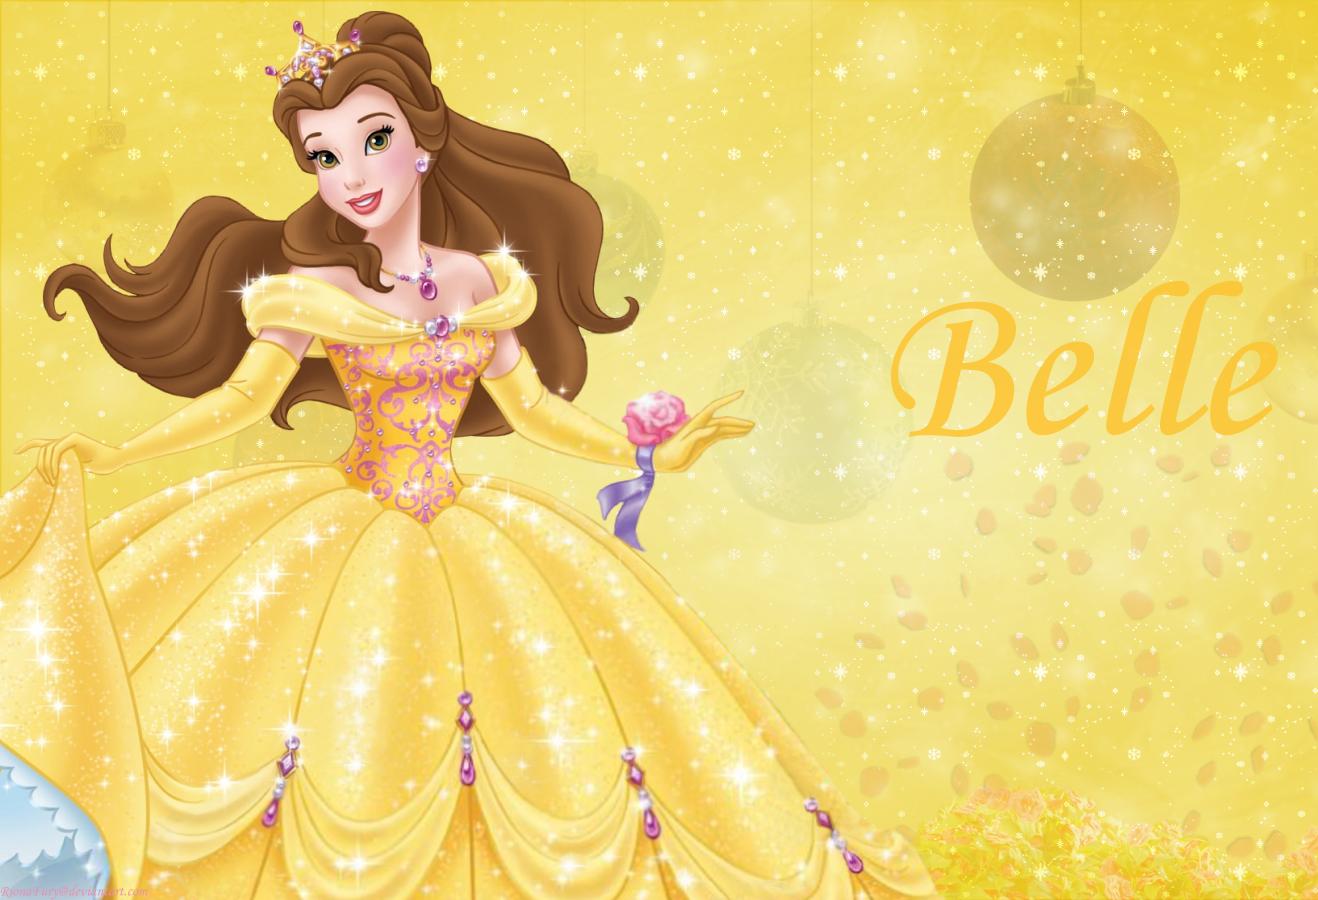 disney princess yellow belle - photo #22